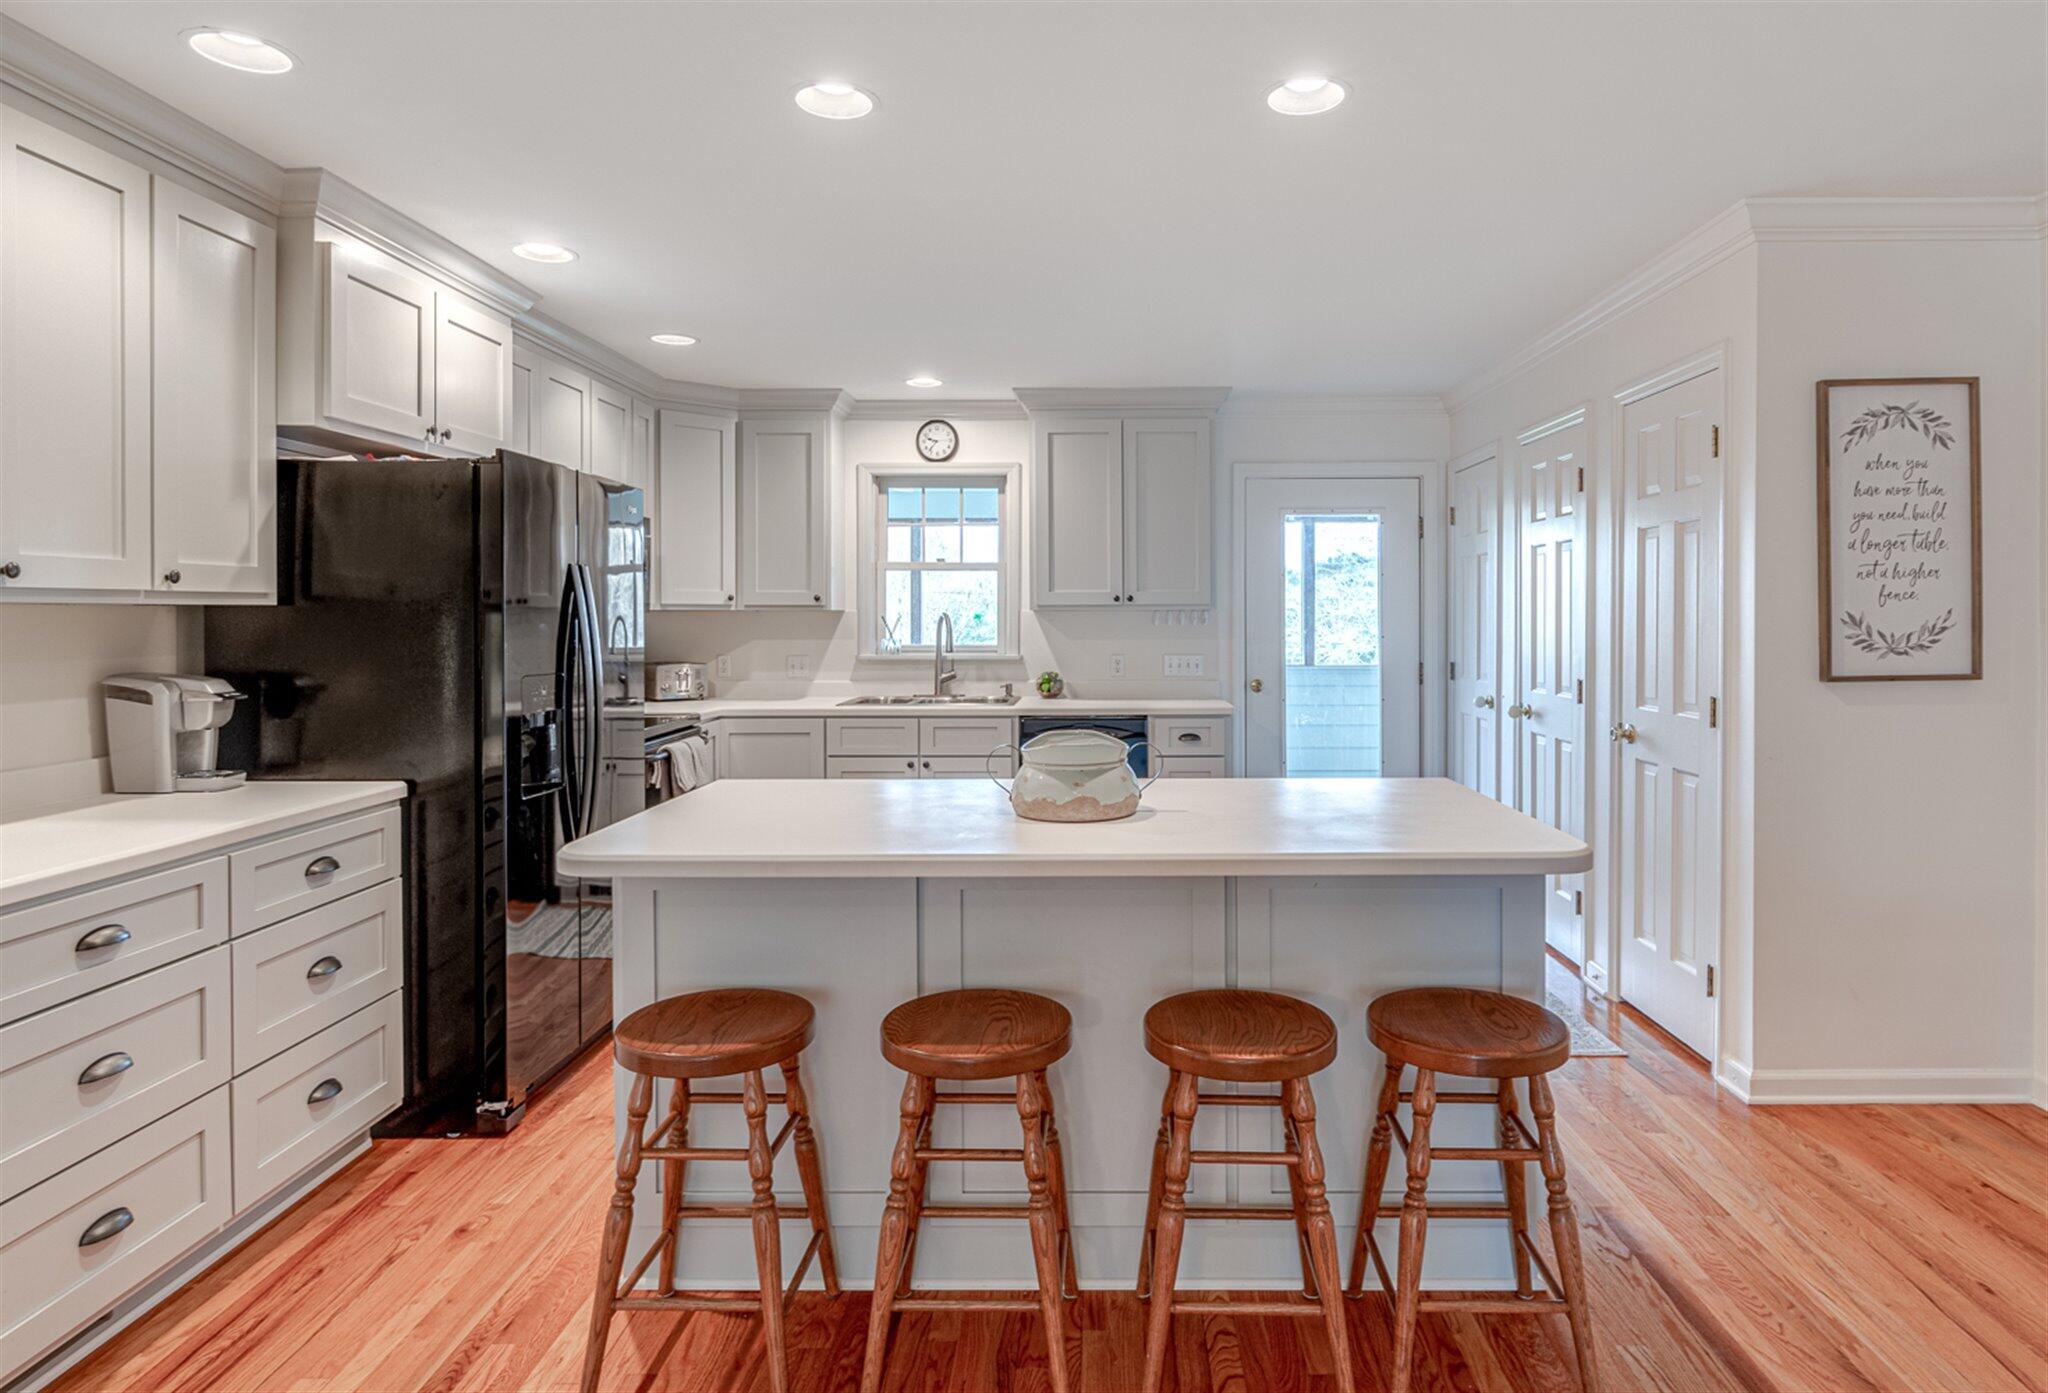 Sullivans Island Homes For Sale - 2107 Middle, Sullivans Island, SC - 14